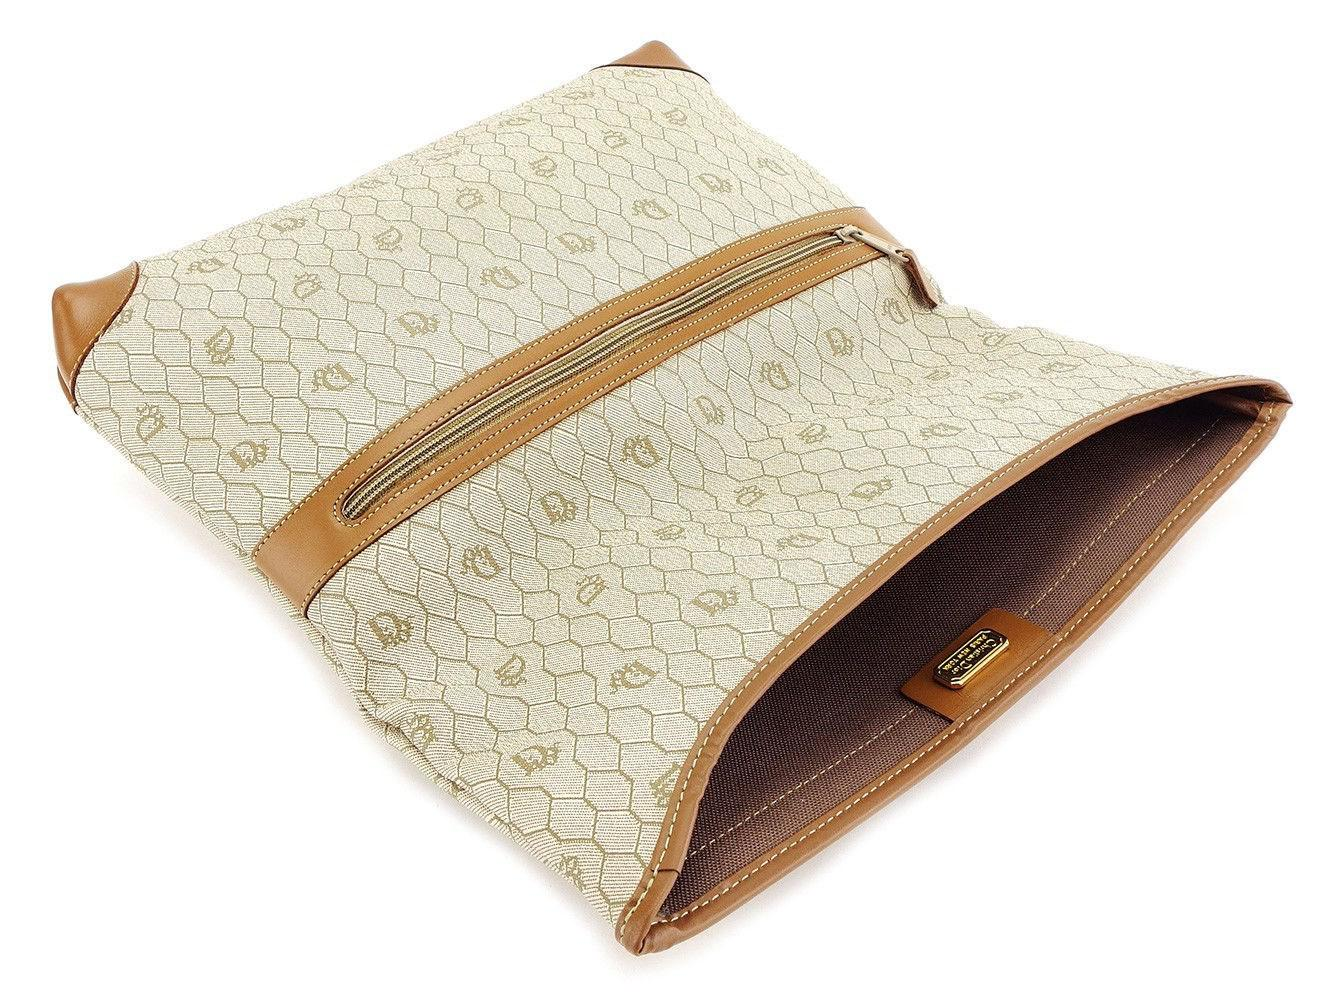 Lyst - Dior Clutch Bag Ladies Men  s Used T3215 in Natural 669ae4c11580c